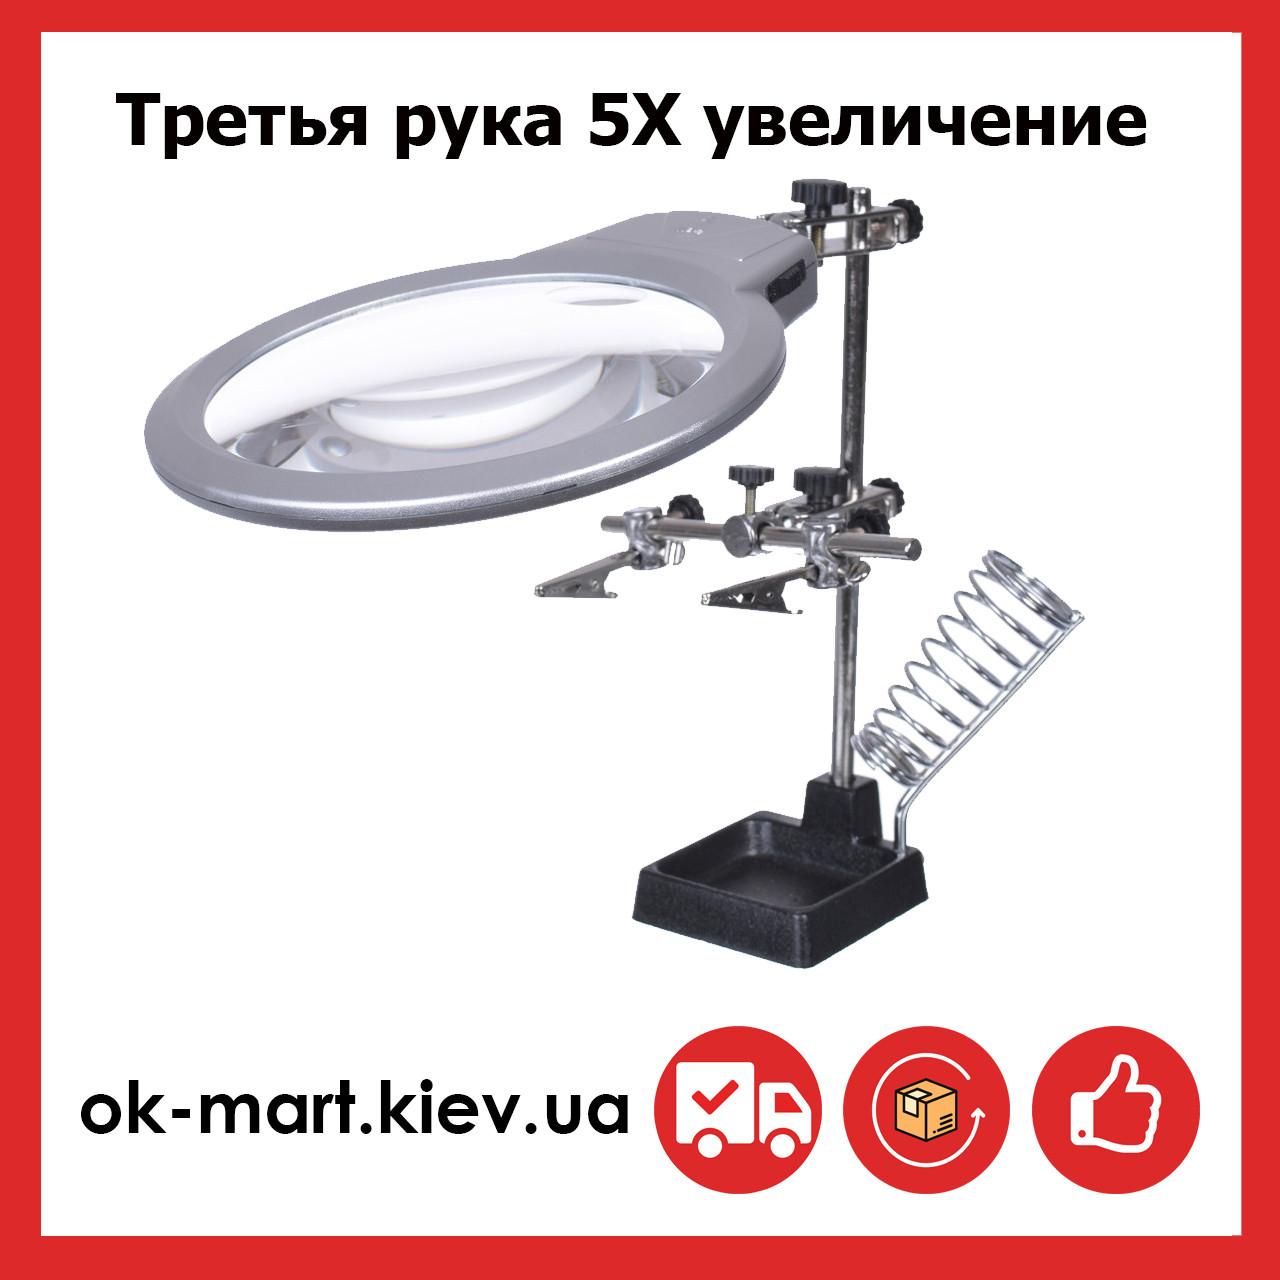 Третья рука 5Х увеличение, LED подсветка, c лупой 85мм, фото 1